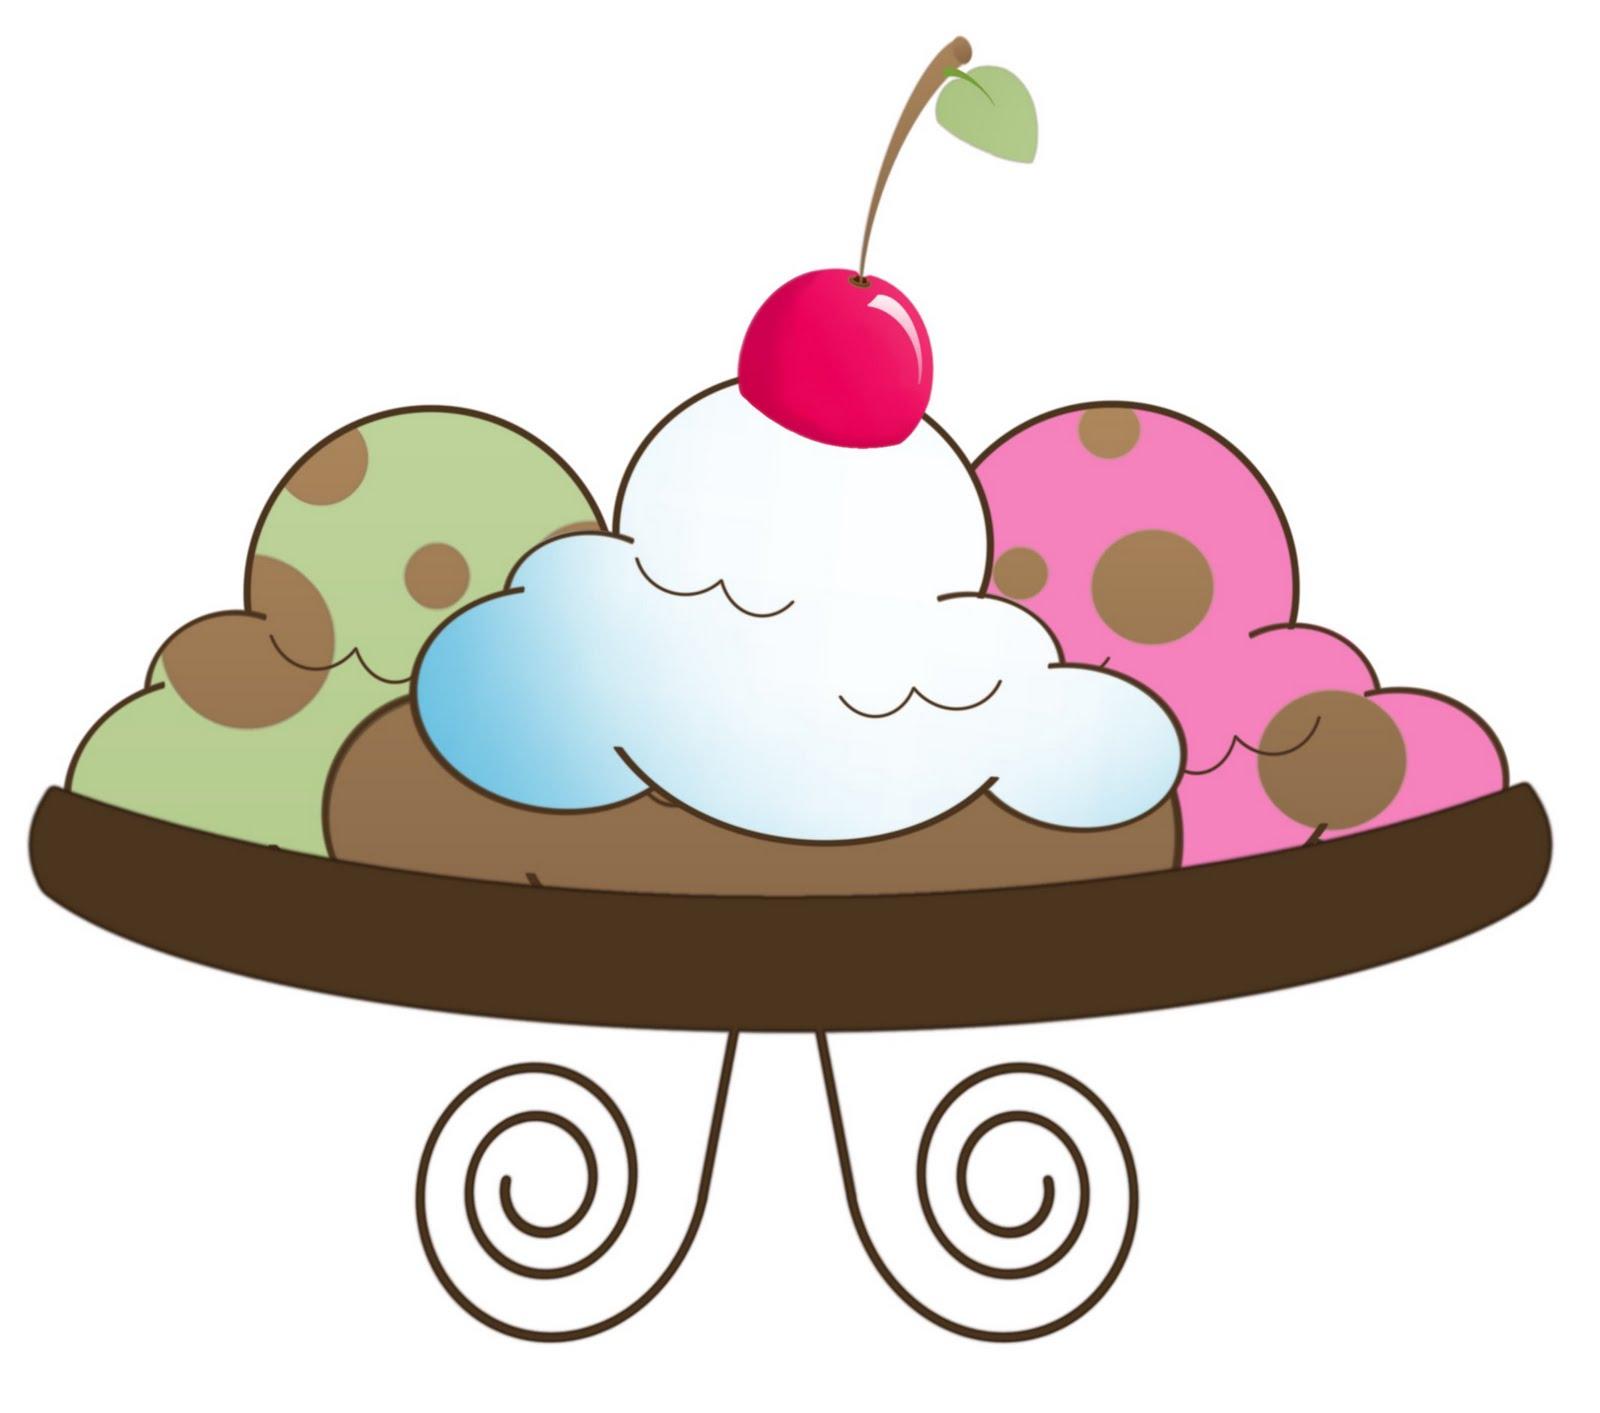 ... Ice cream sundae clipart  - Ice Cream Sundae Clipart